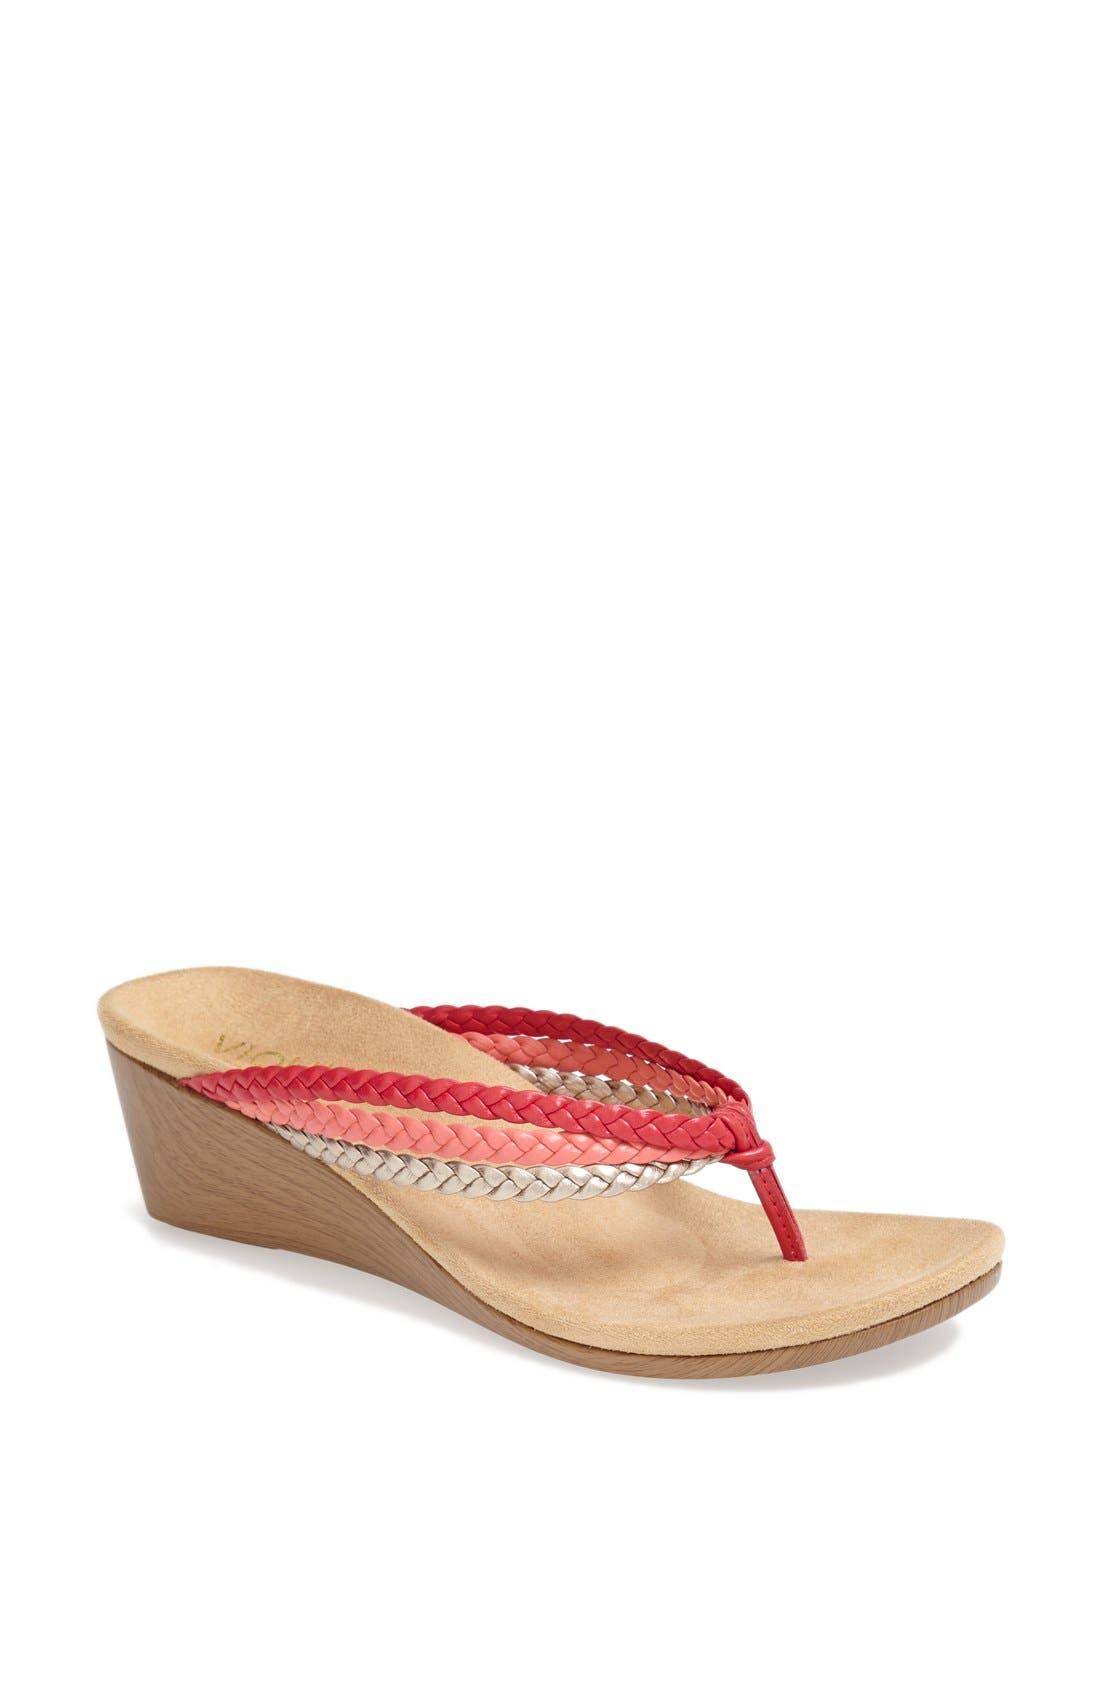 Main Image - Vionic 'Ramba' Wedge Sandal